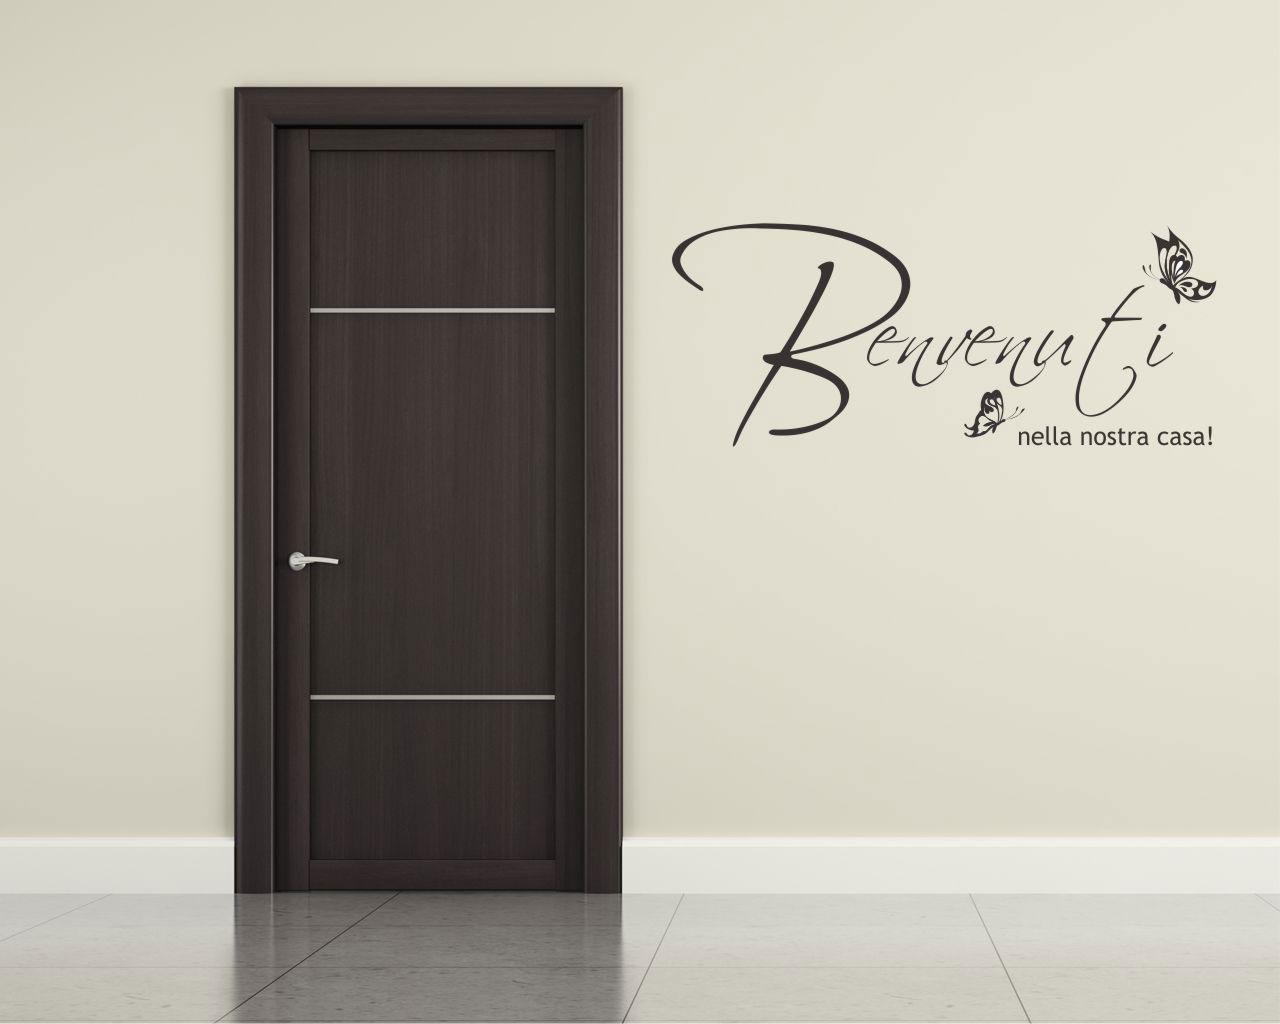 Benvenuti nella nostra casa frasi aforismi citazioni for Adesivi x pareti